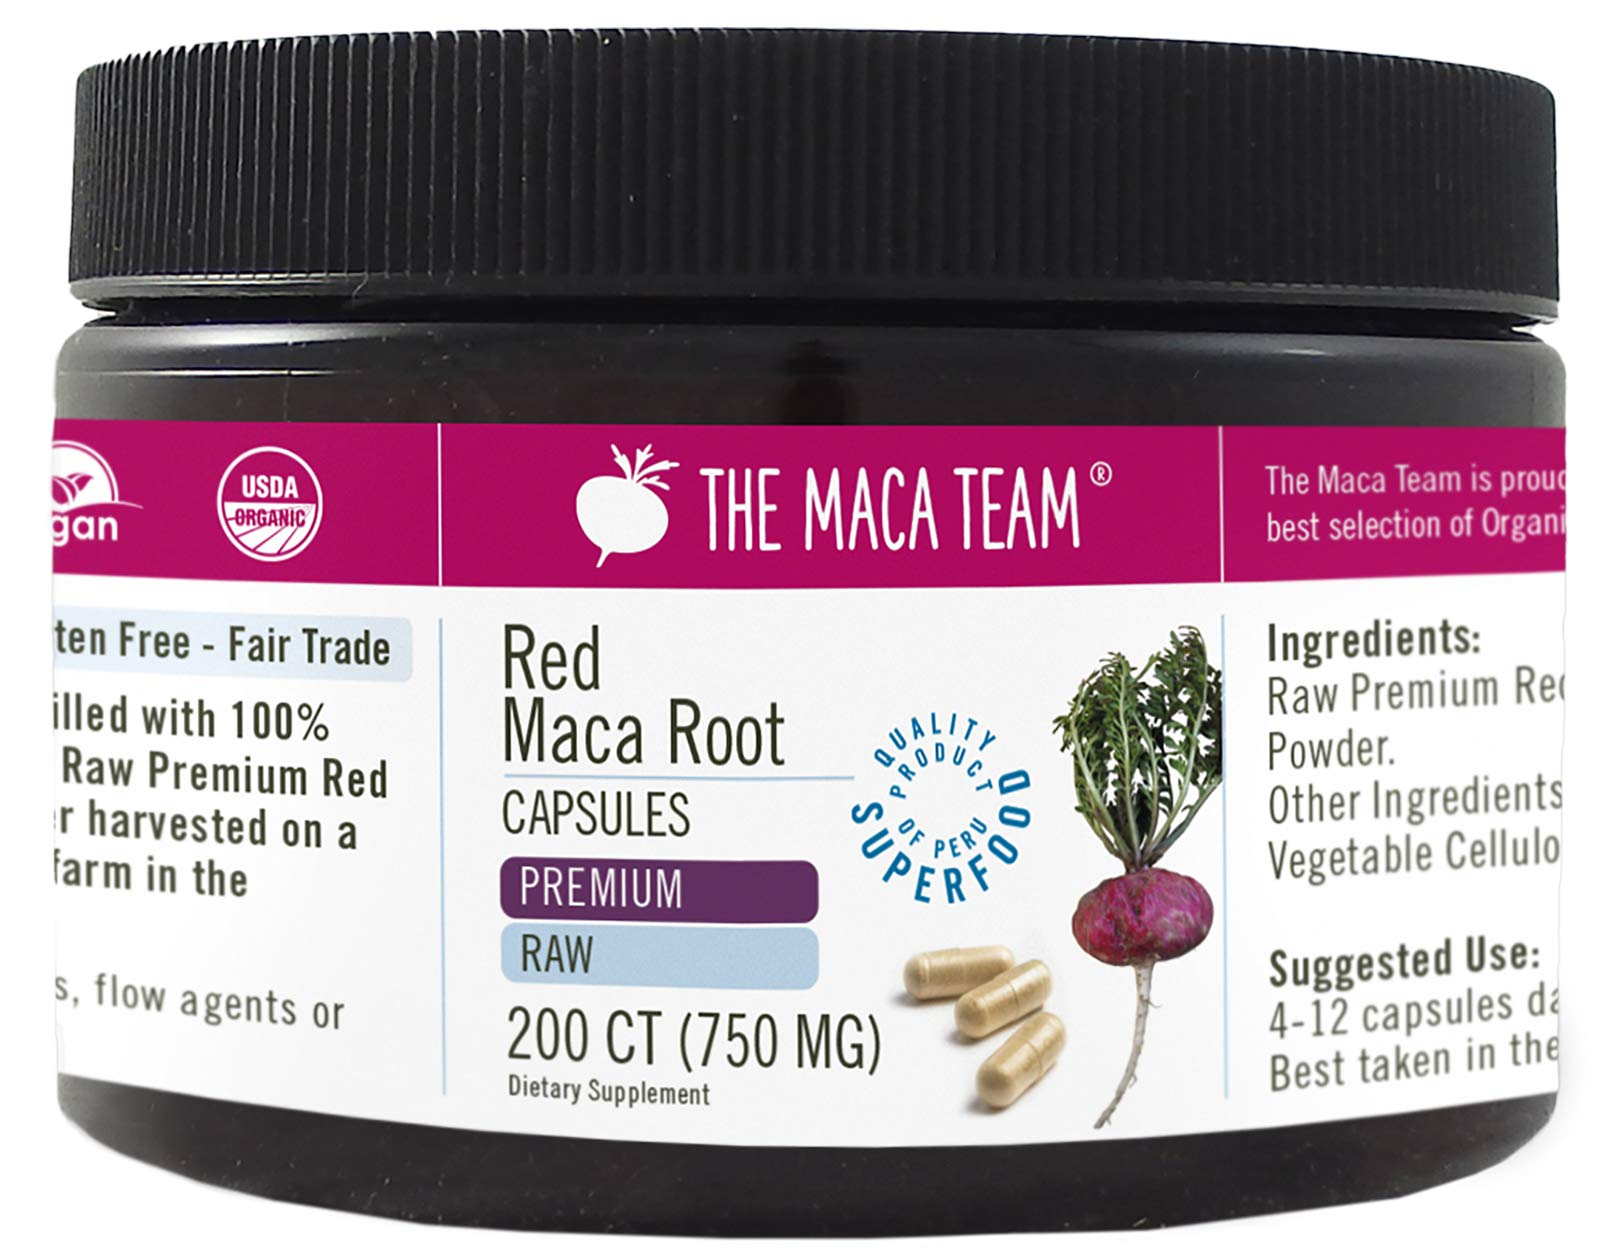 The Maca Team Premium Raw Red Maca Root Capsules, Certified Organic, Vegan, GMO- and Gluten-Free, 750 mg Size, 200 Count